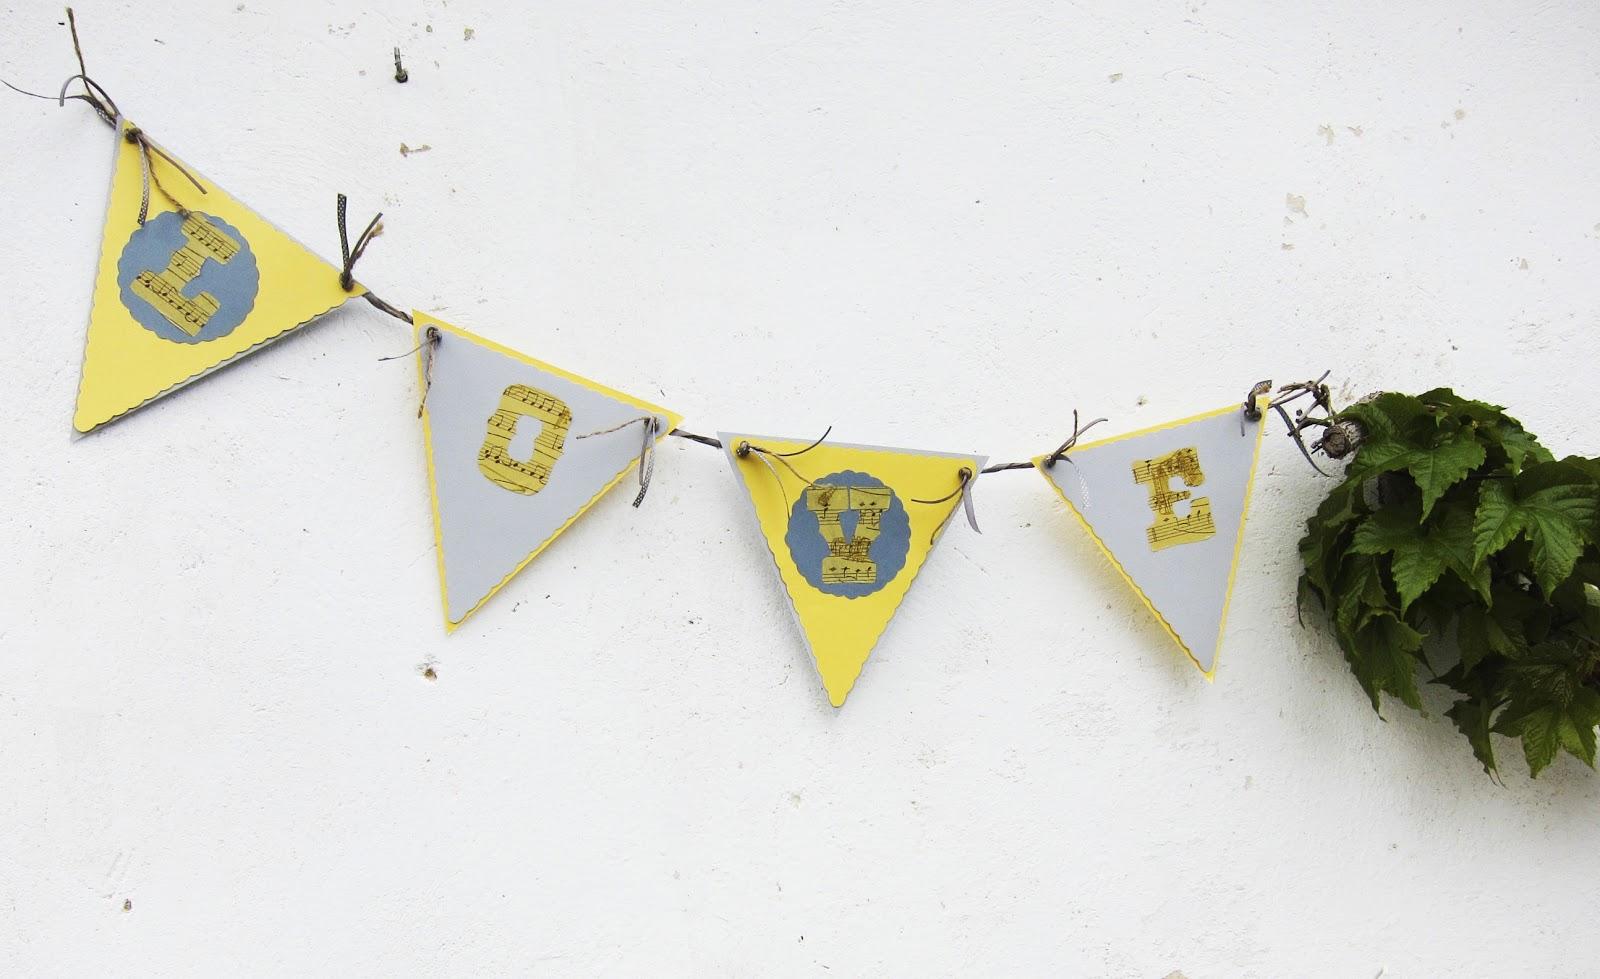 http://samikaypompom.bigcartel.com/product/banderines